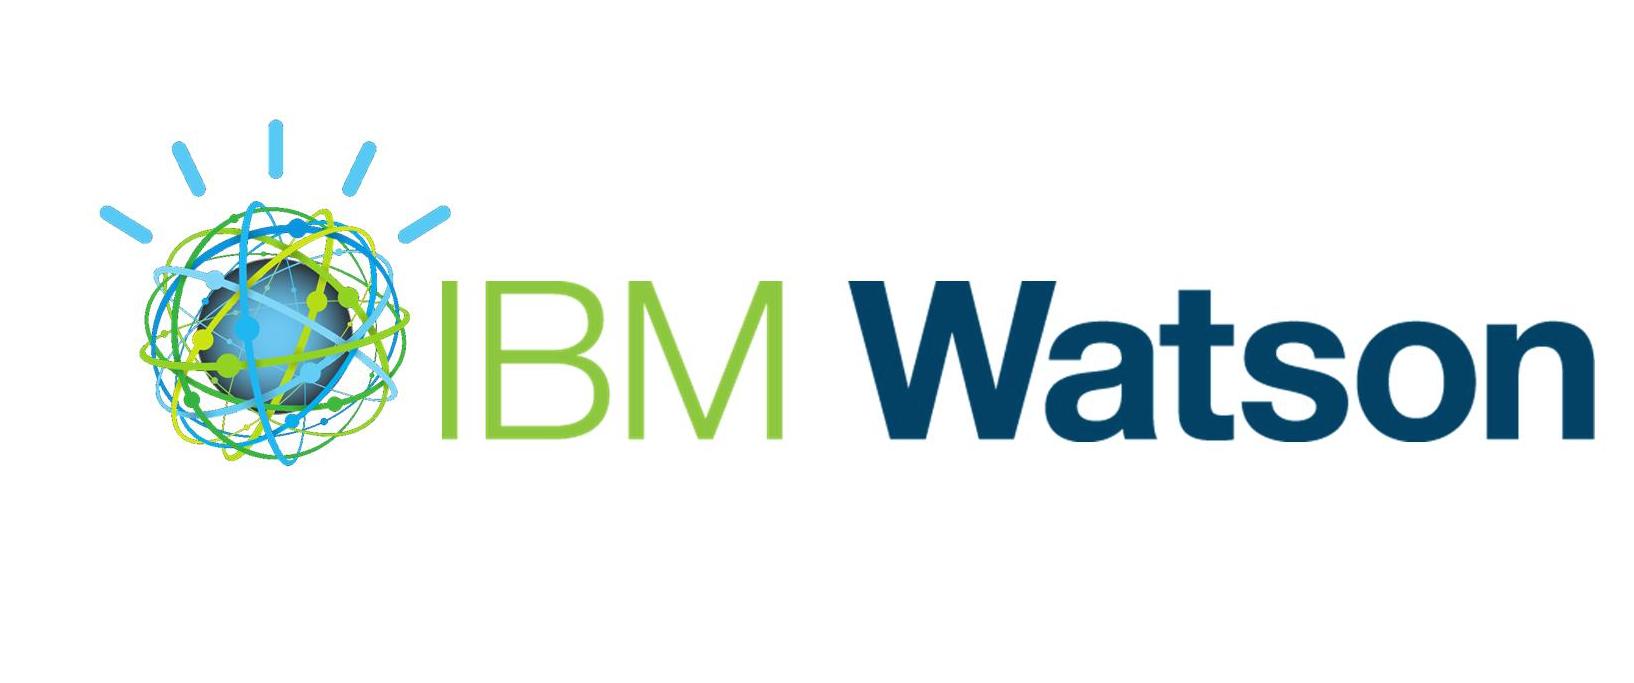 Virtual Software Logo photo - 1